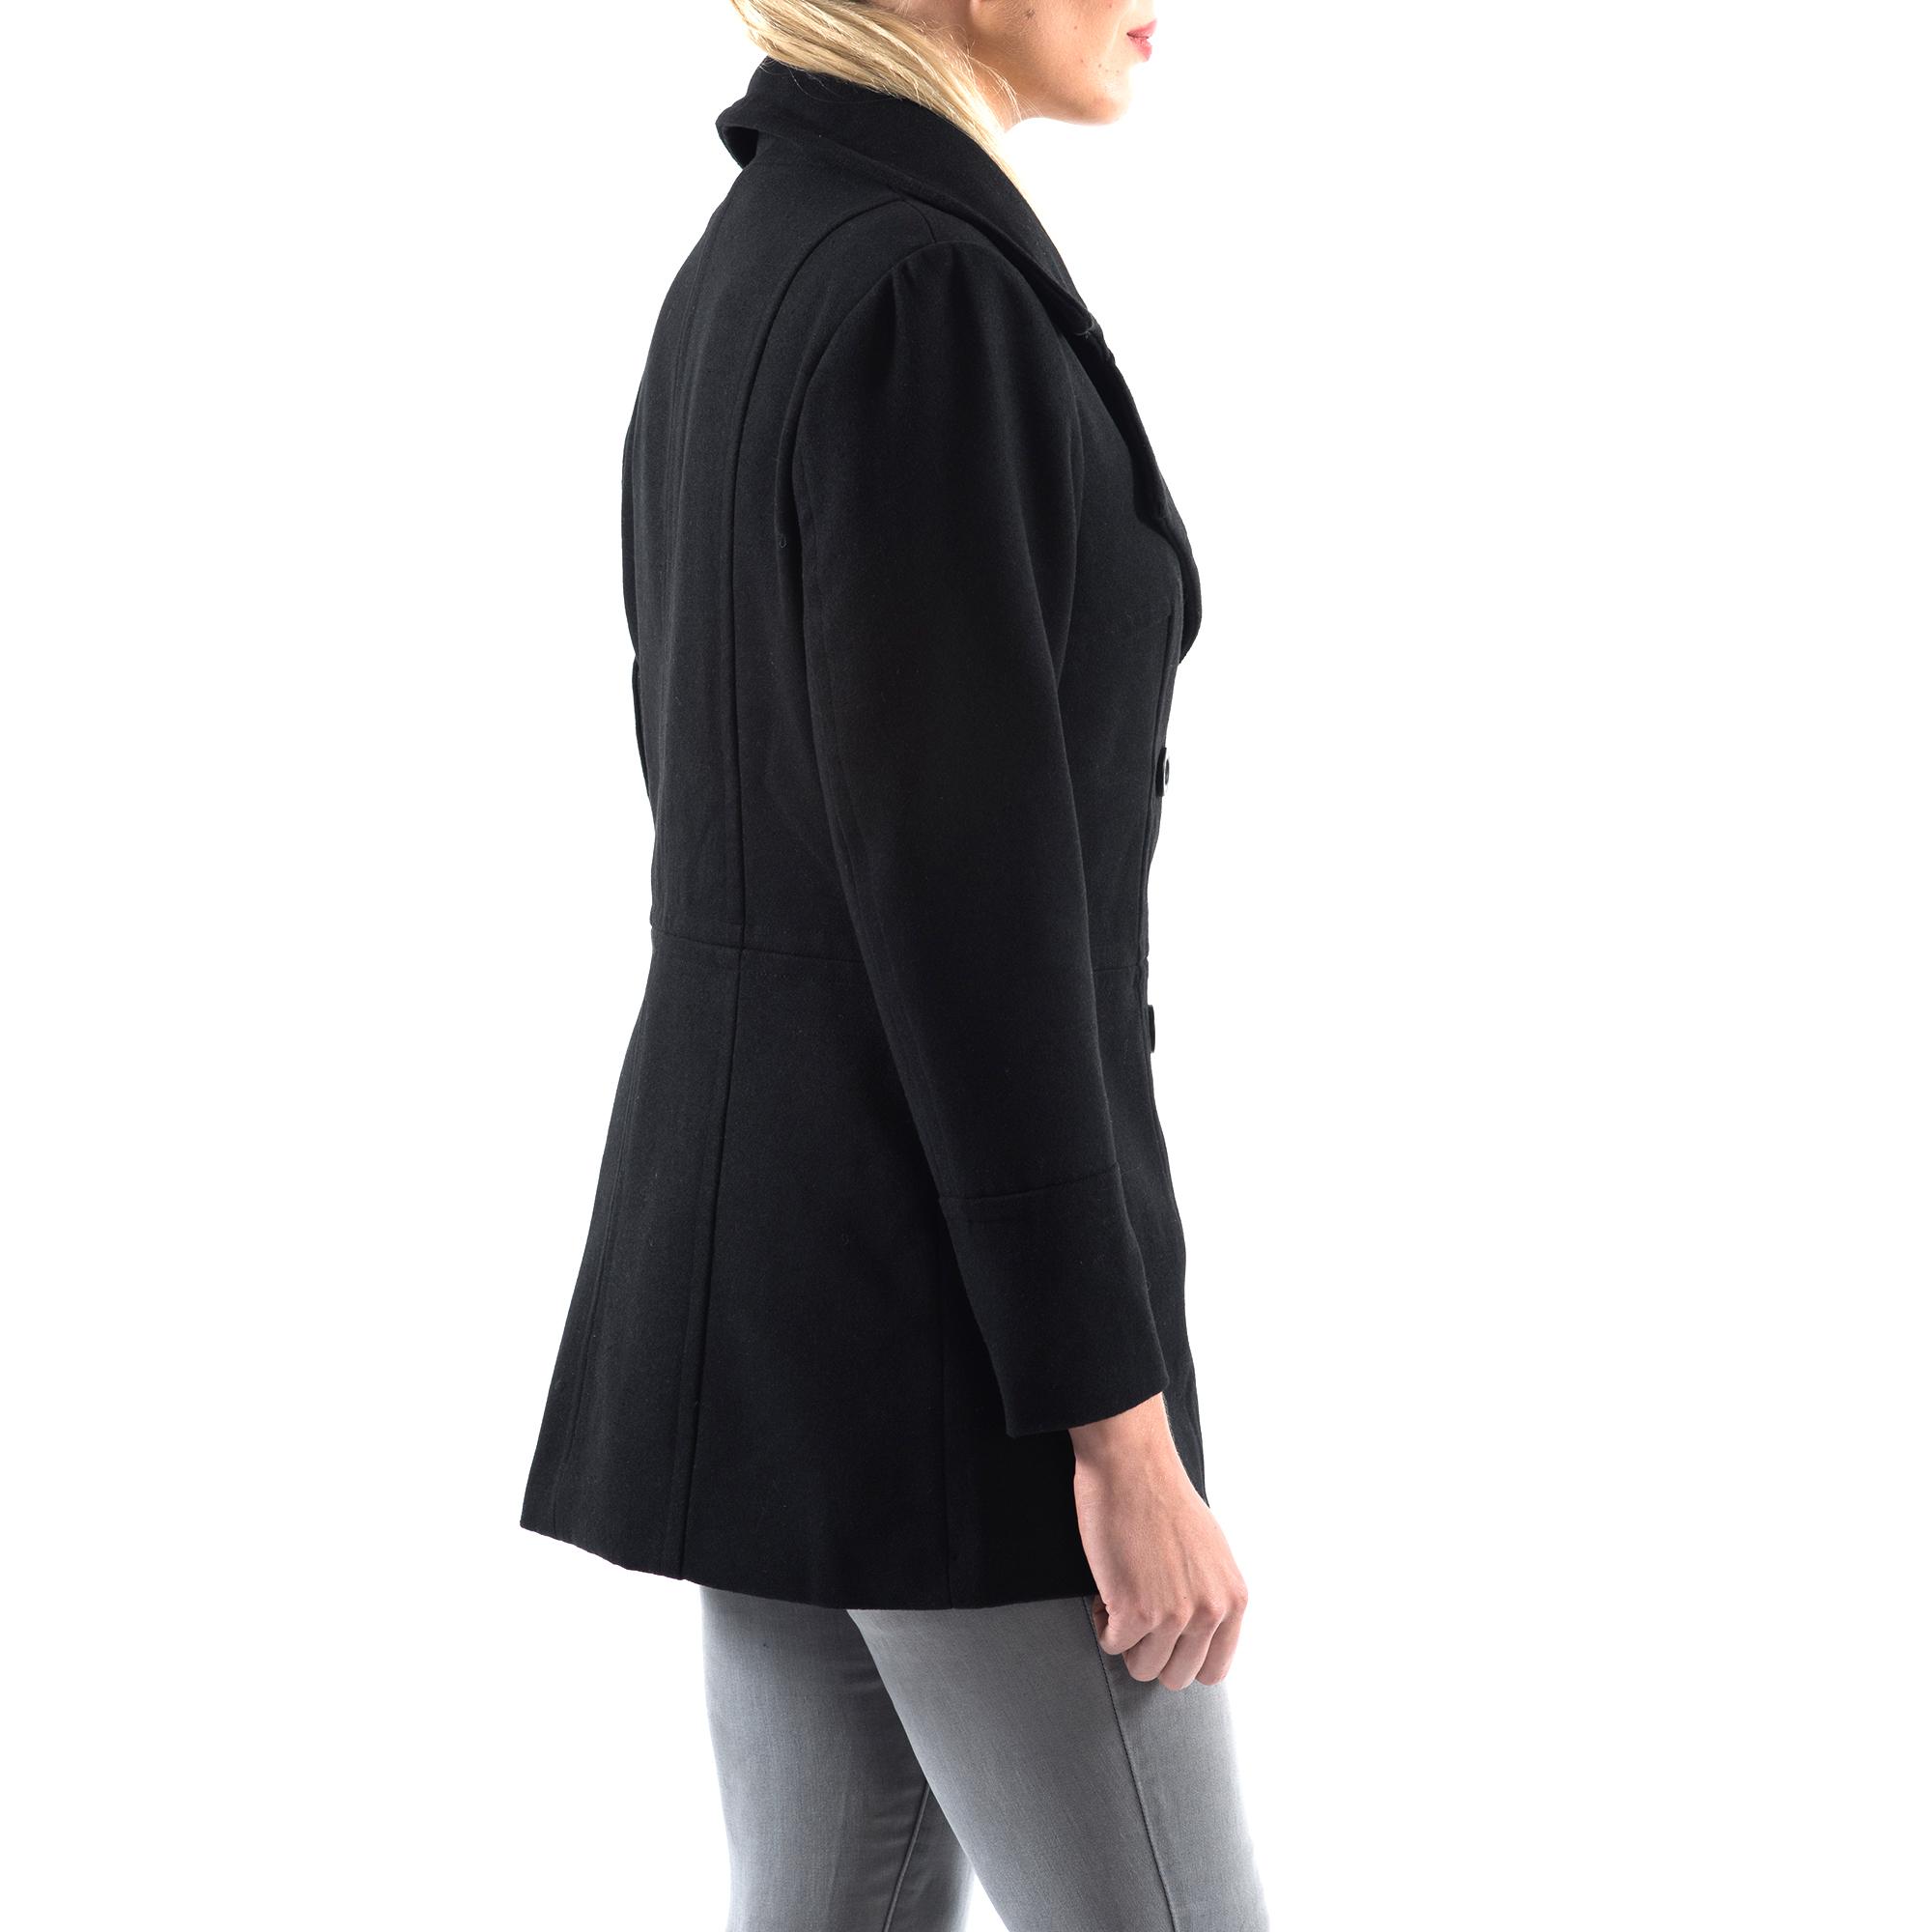 Alpine-Swiss-Emma-Womens-Peacoat-Jacket-Wool-Blazer-Double-Breasted-Overcoat-New thumbnail 20